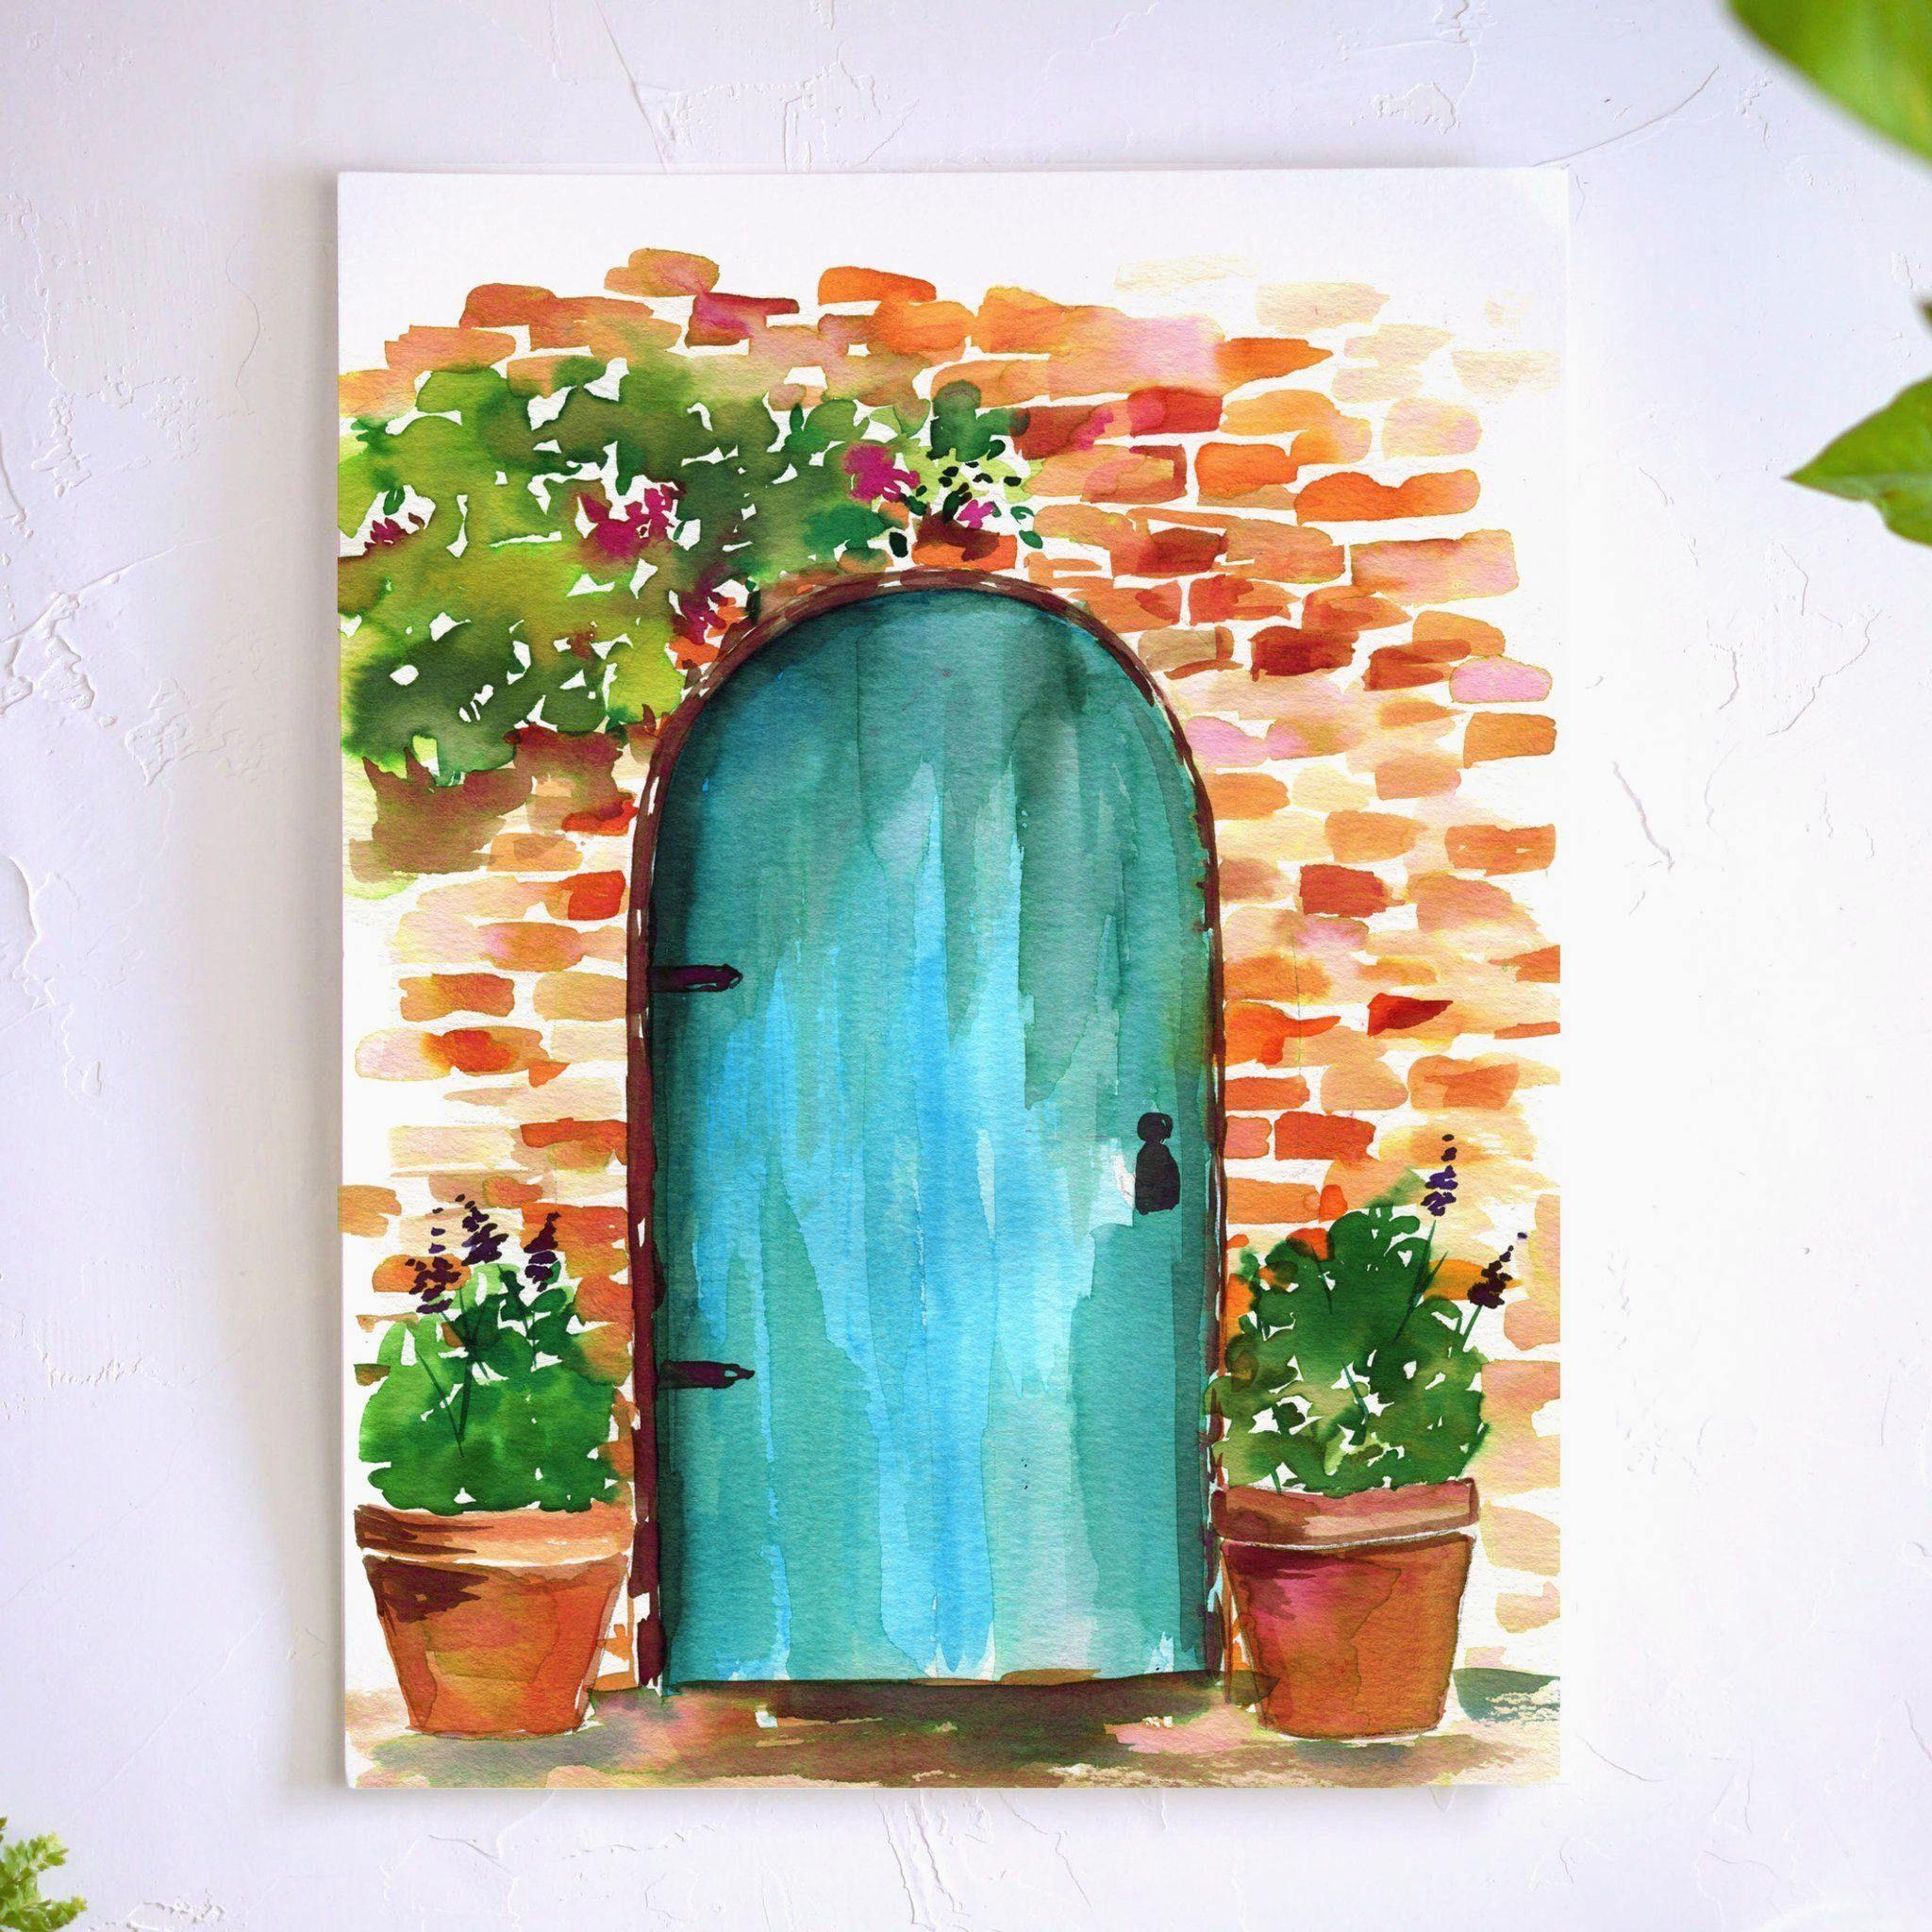 Rustic Doorway Watercolor Kit - #watercolorart